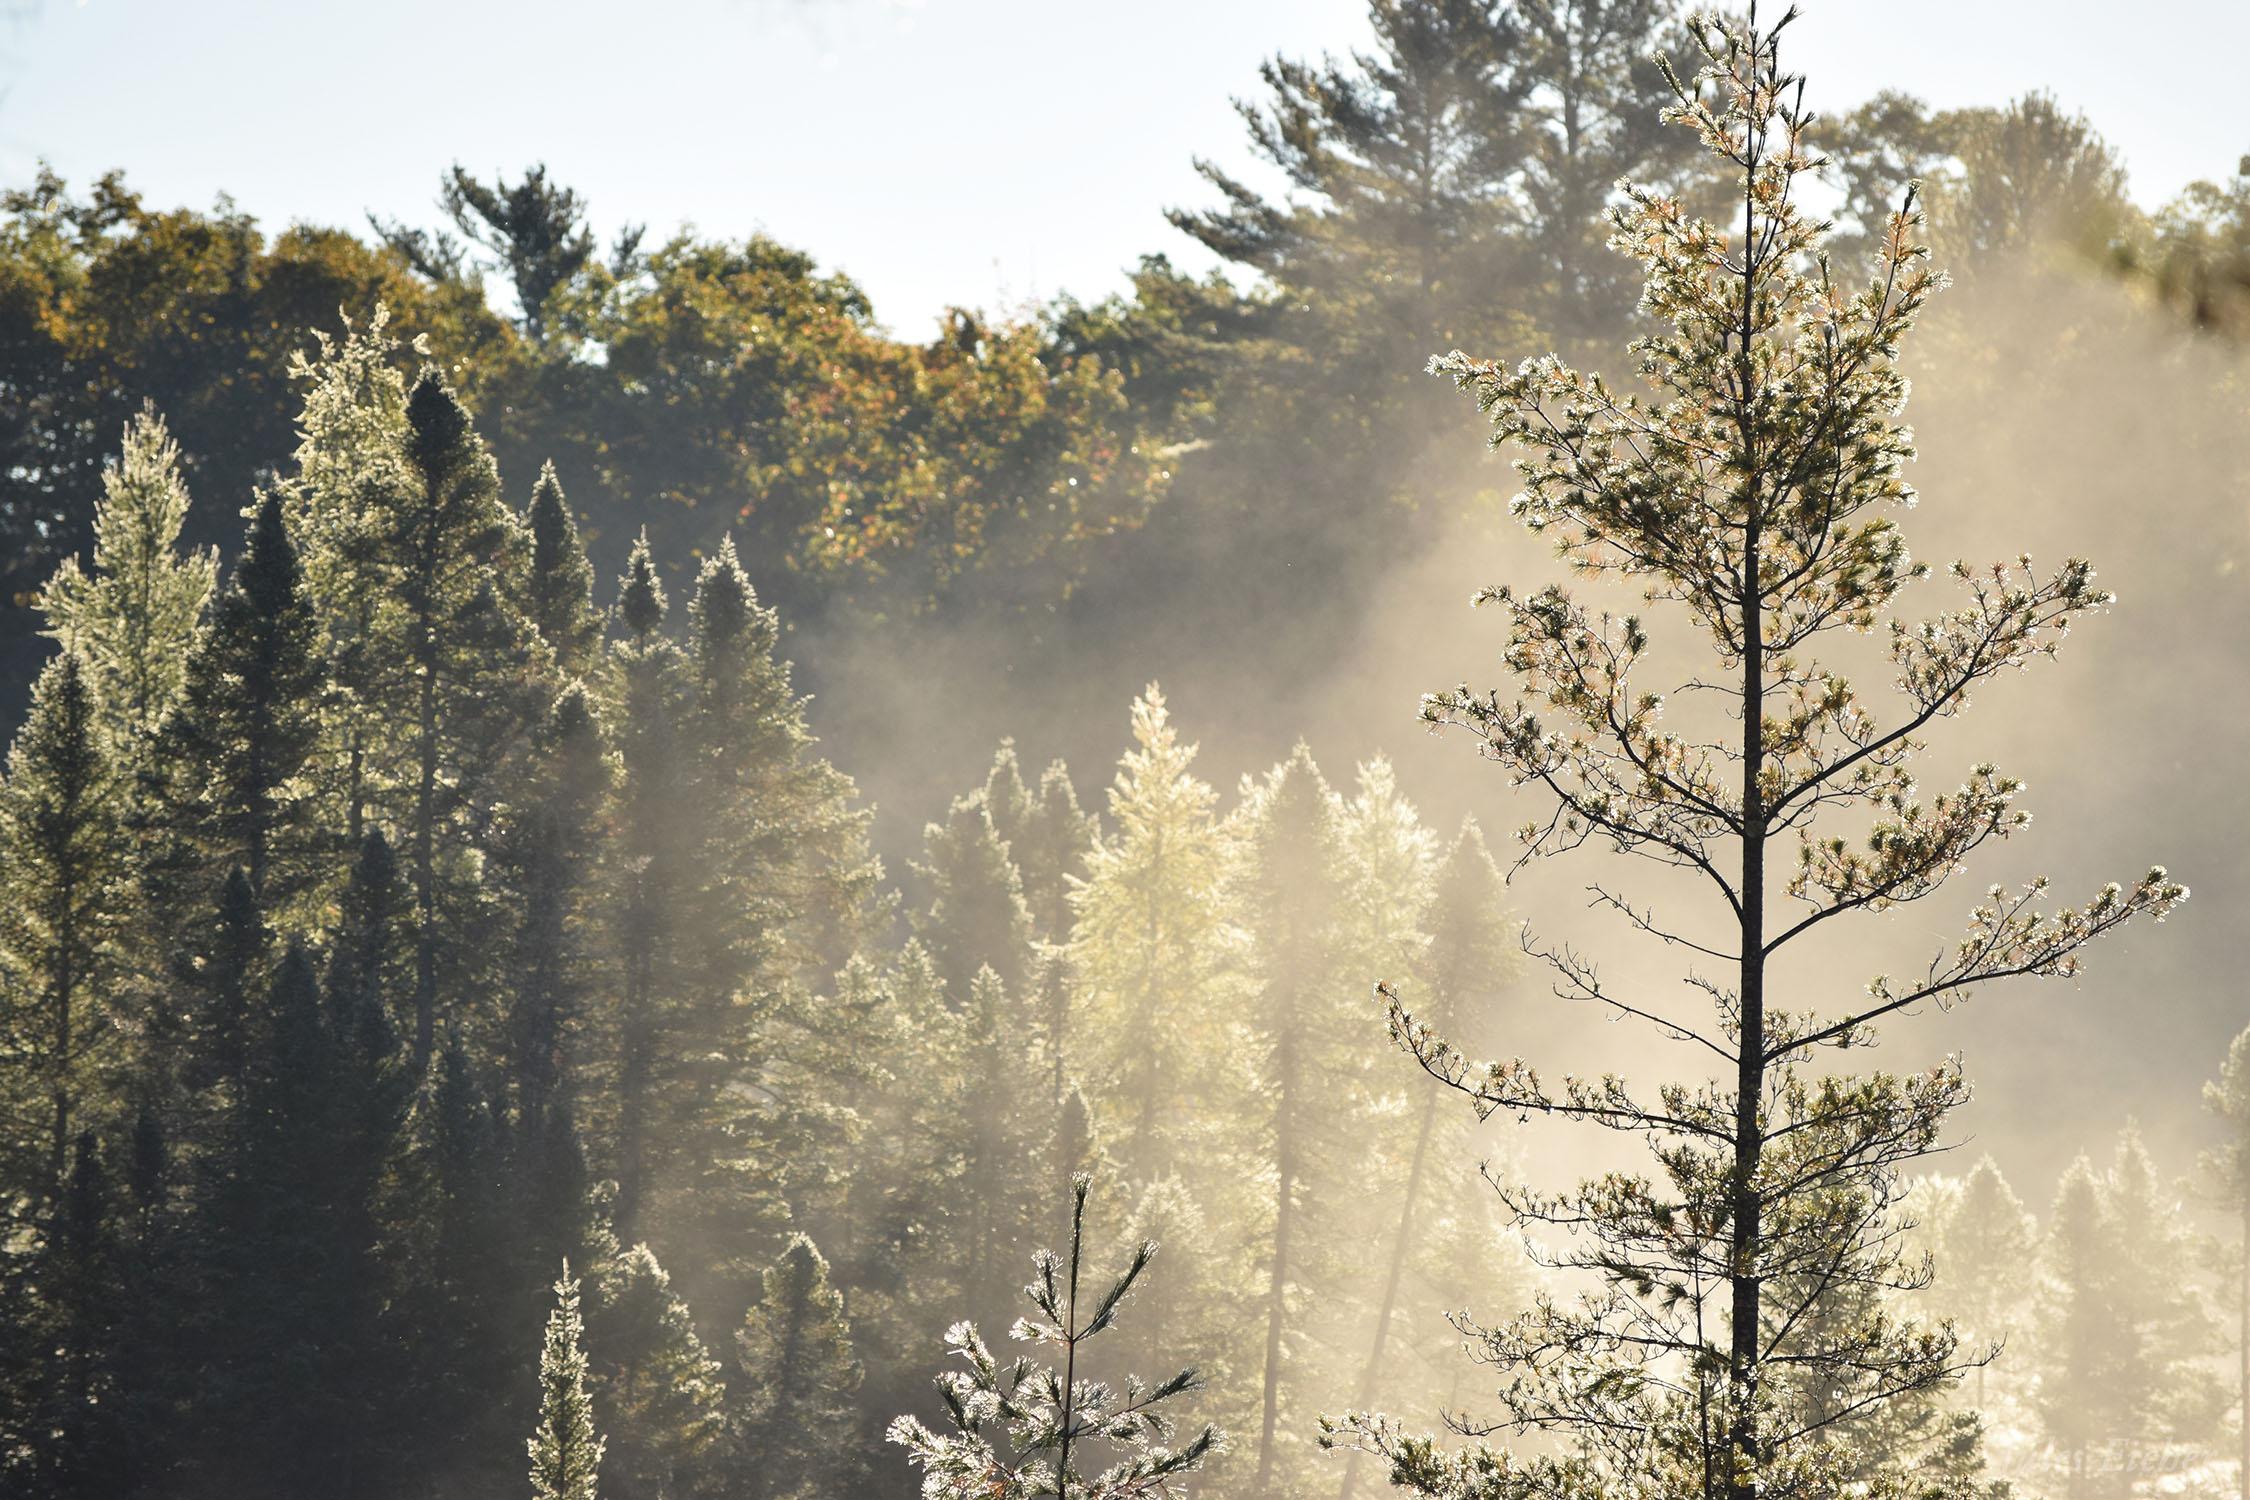 CS13 Nature Photography - Conserve School